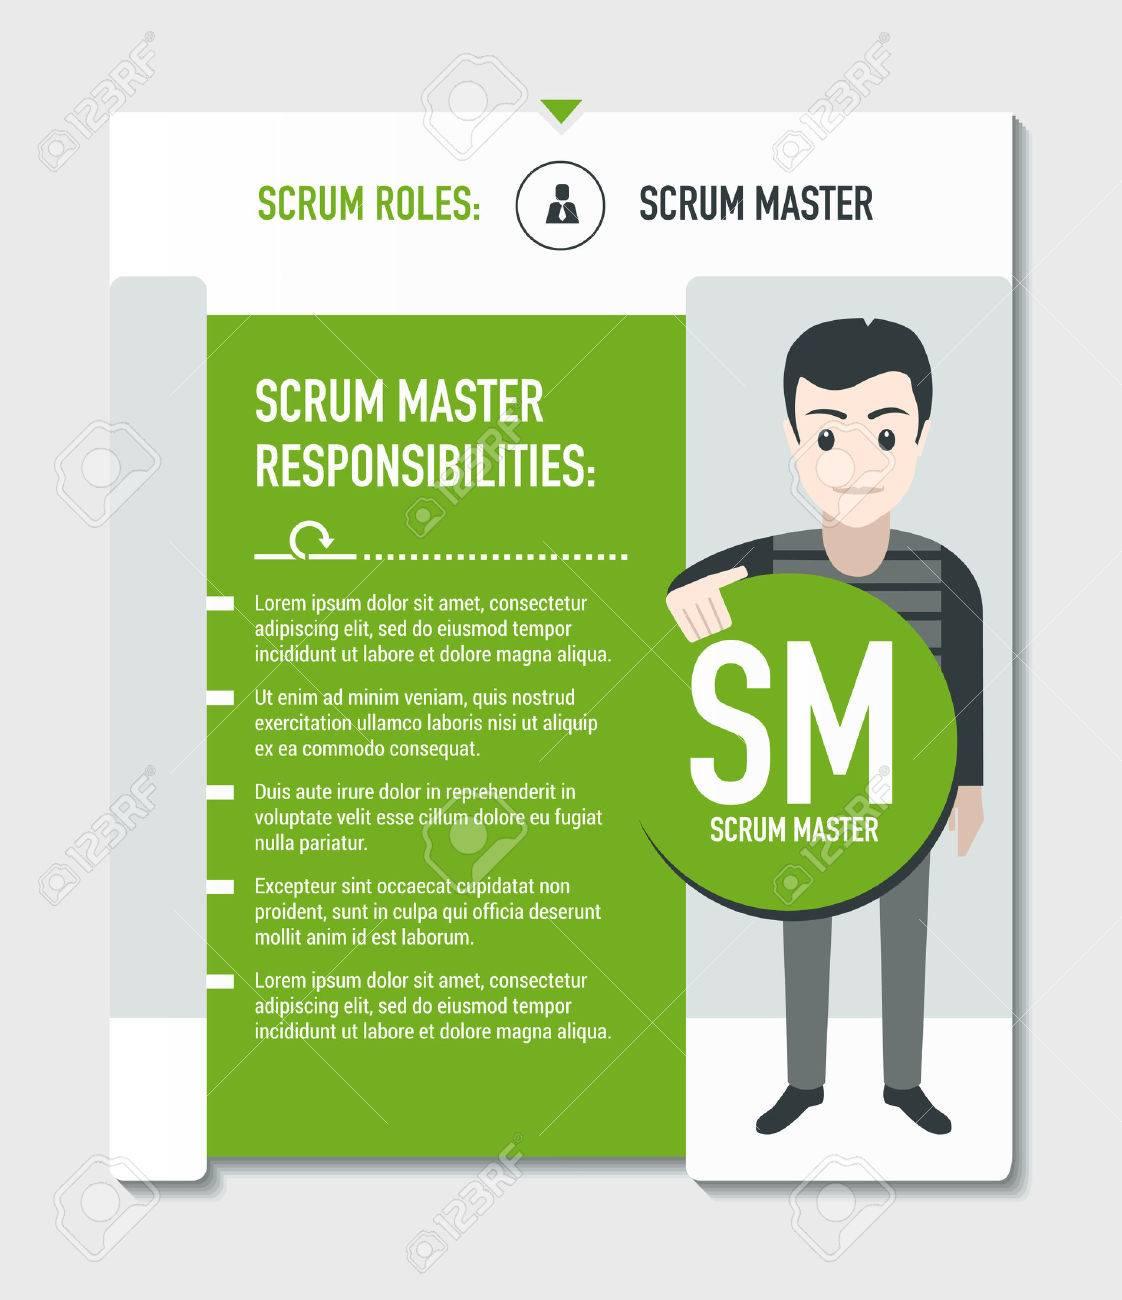 scrum roles scrum master responsibilities template in scrum